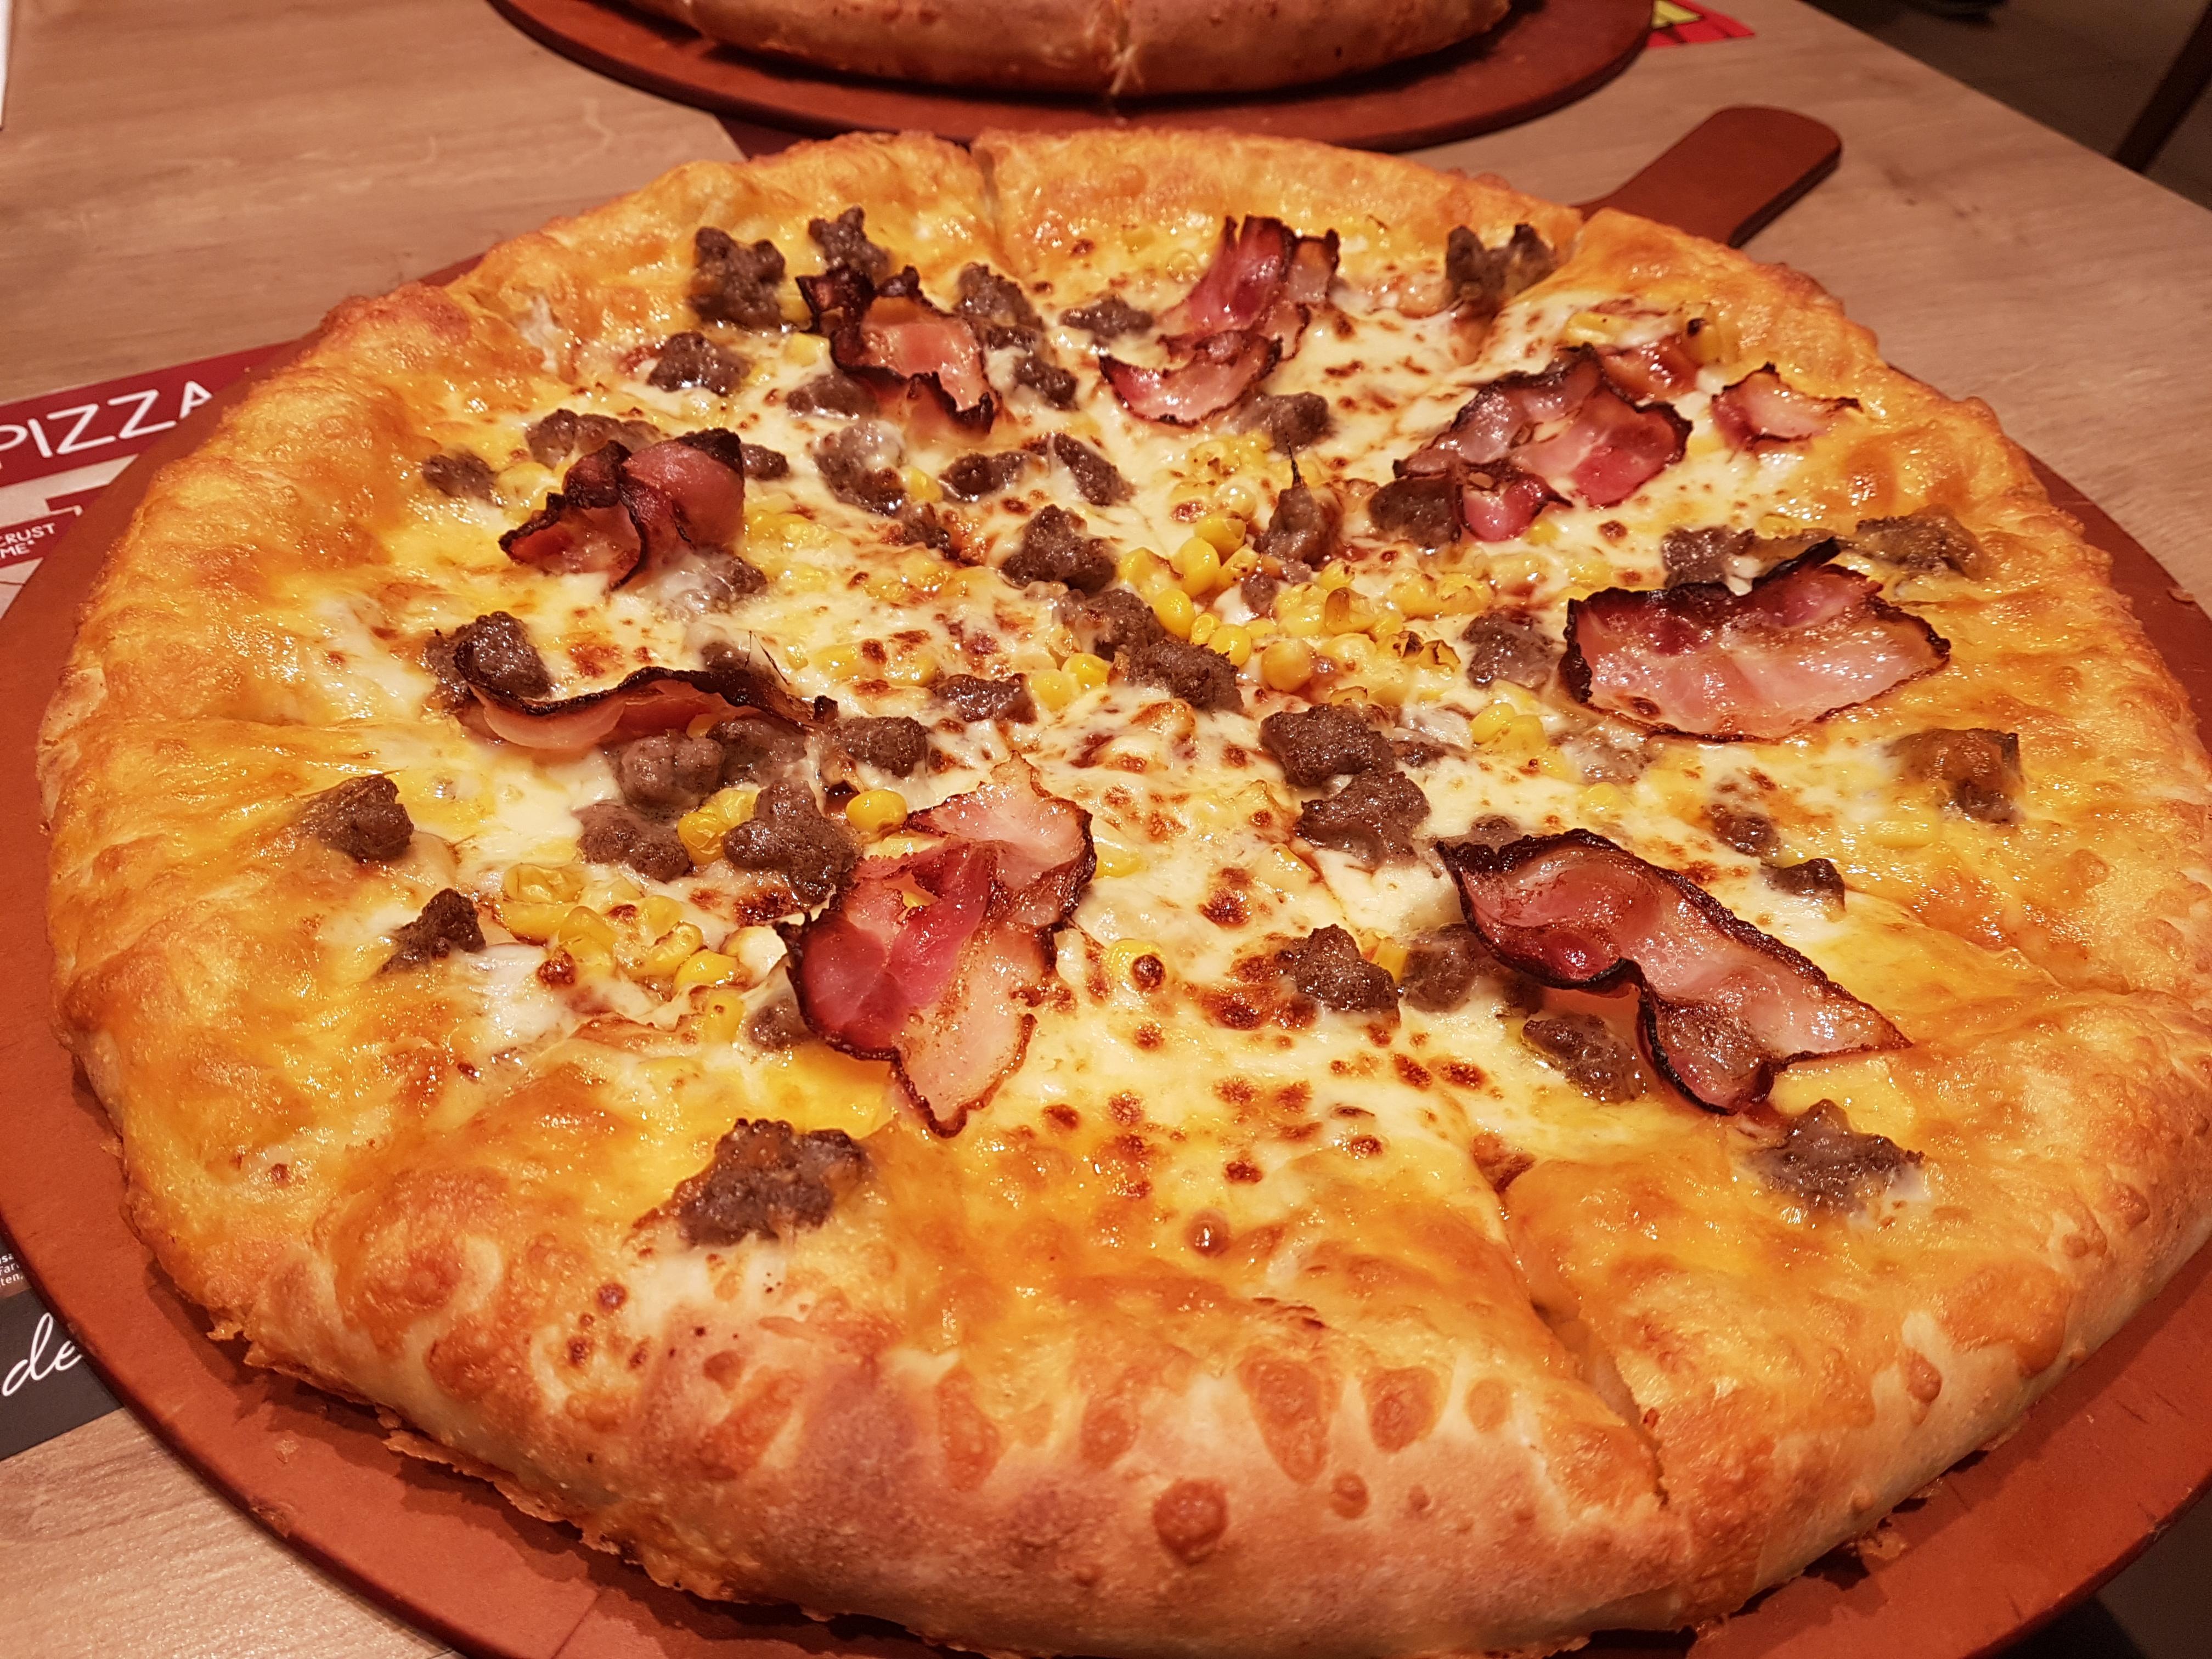 https://foodloader.net/Holz_2017-11-30_Pizza_Hut_Golden_Cheesy_Crust_BBQ_Lovers.jpg